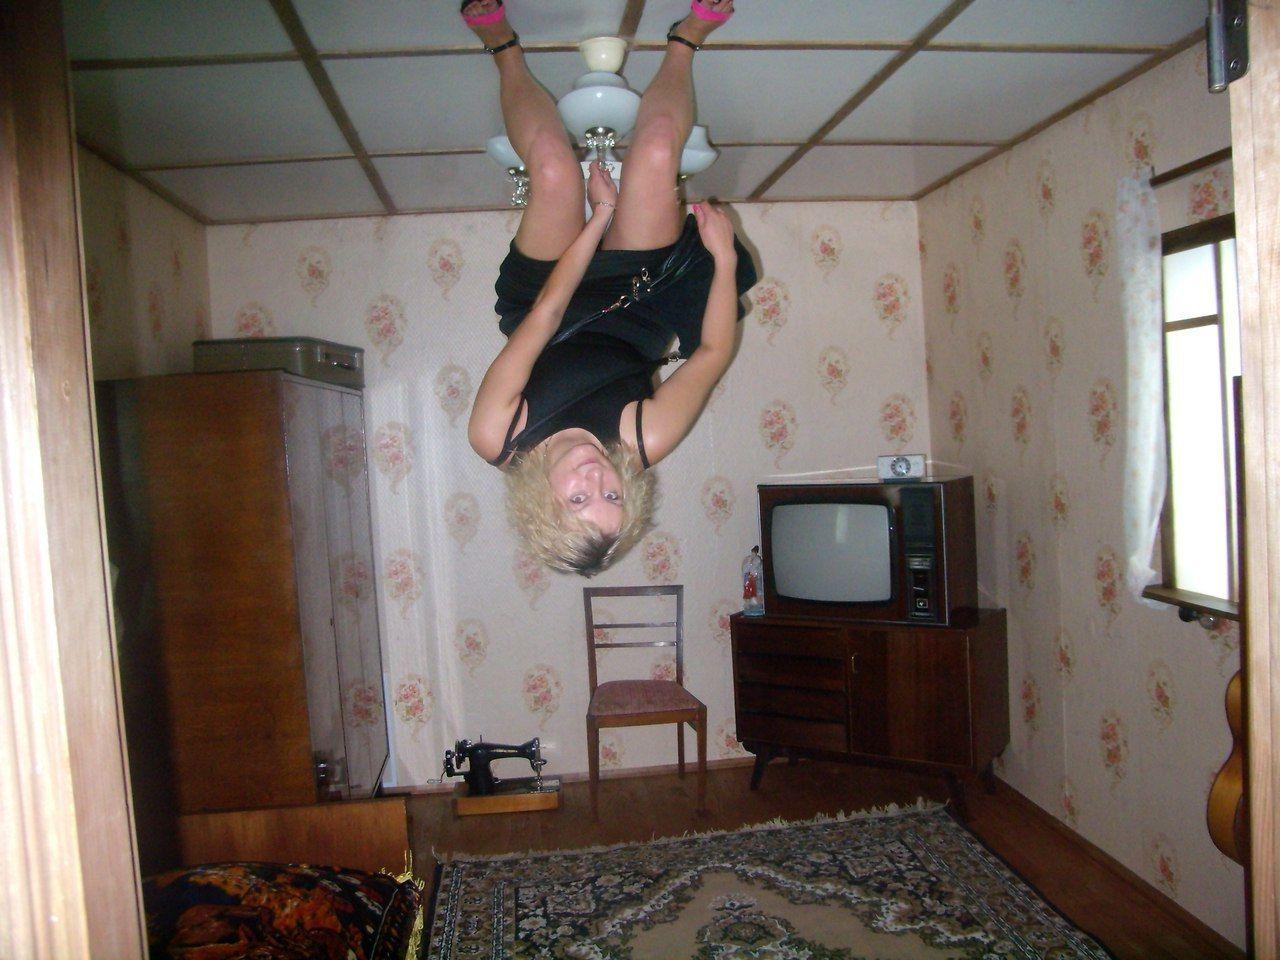 Фотоприколы на каждый день ...: pictures11.ru/fotoprikoly-na-kazhdyj-den.html